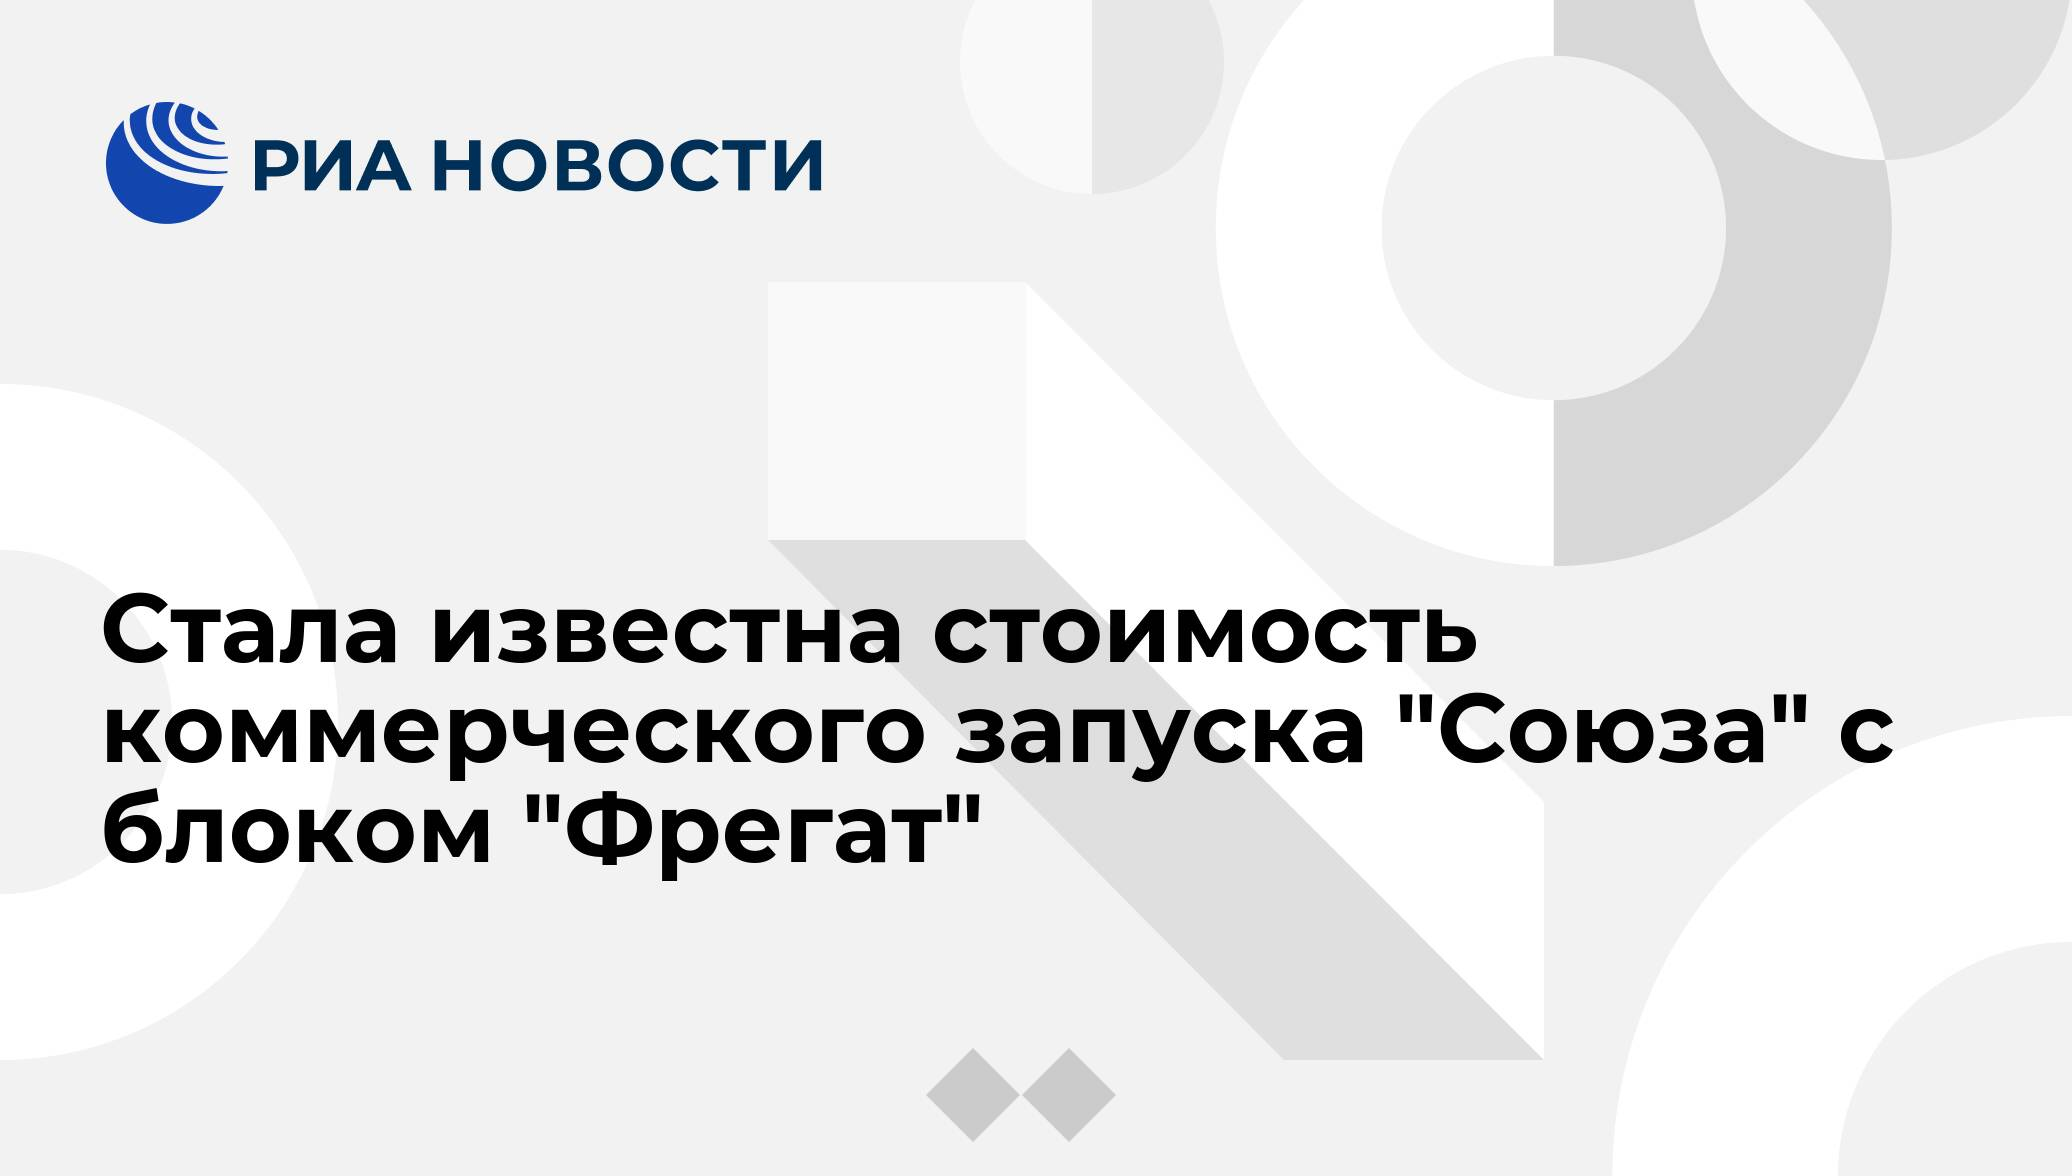 https://cdn22.img.ria.ru/images/sharing/article/1529826936.jpg?15241483651538491887